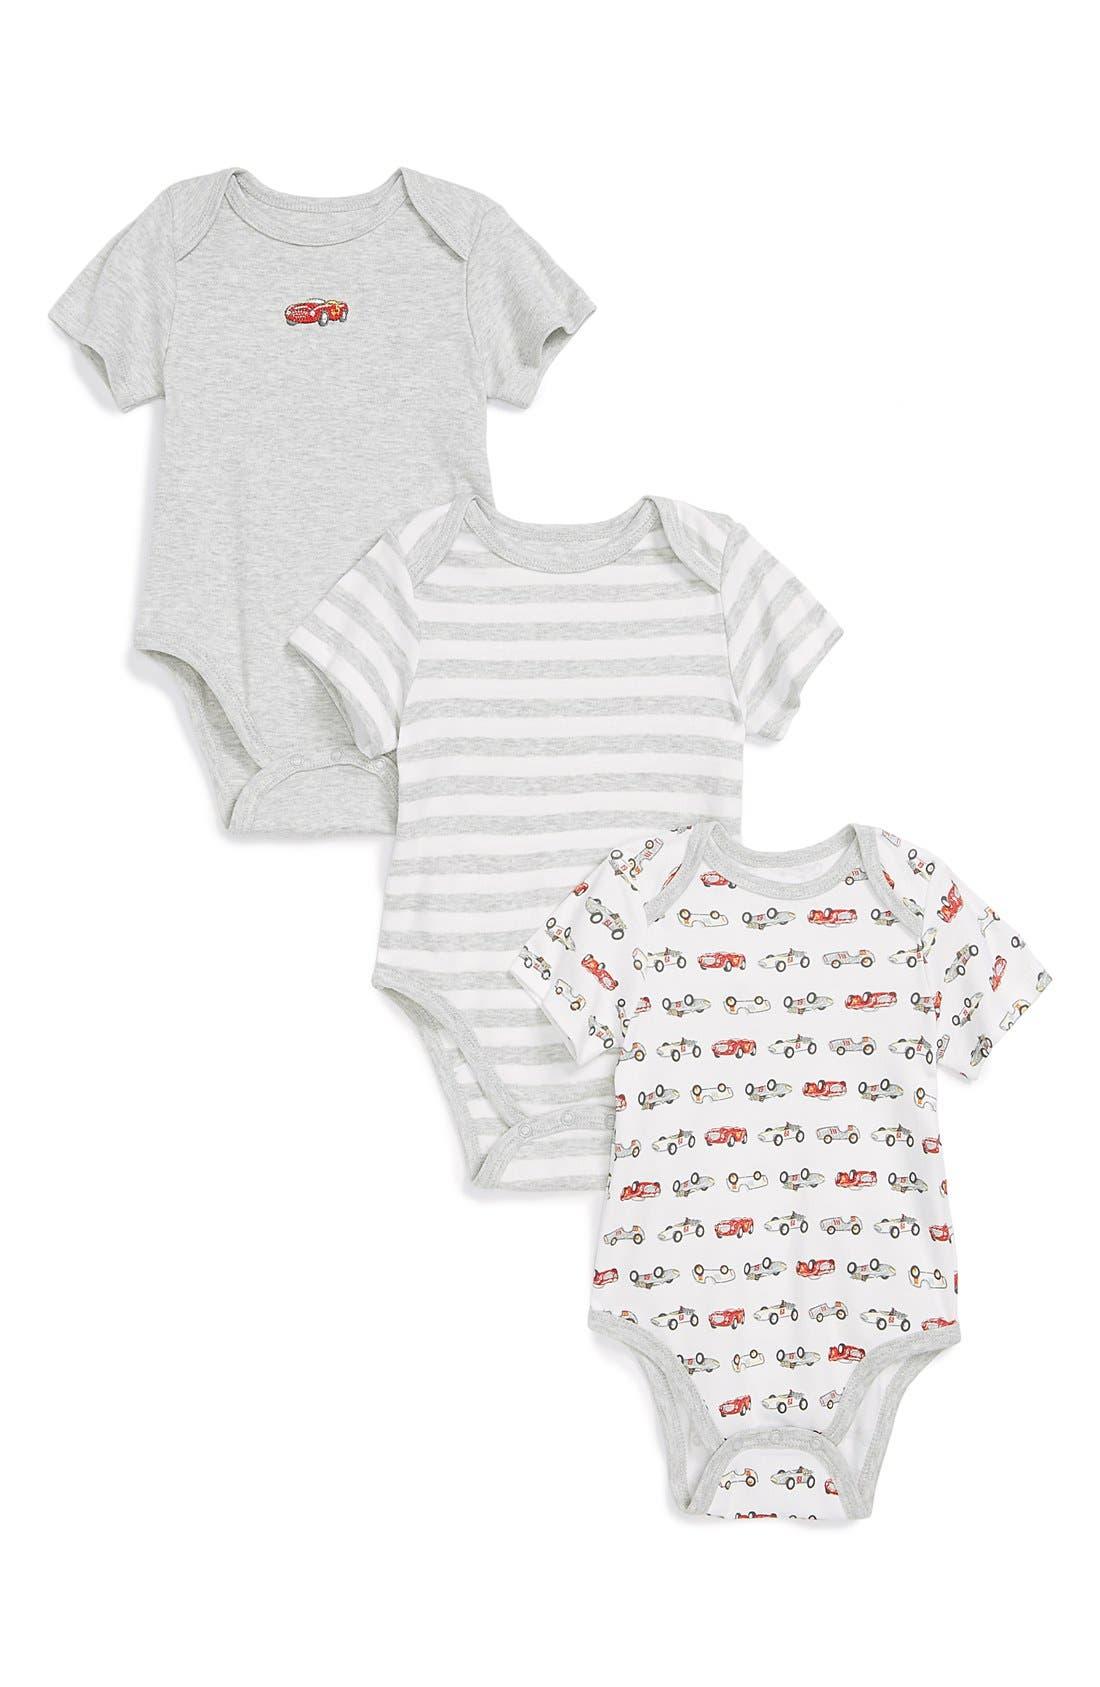 Main Image - Little Me 'Race Car' Bodysuits (Set of 3) (Baby Boys)